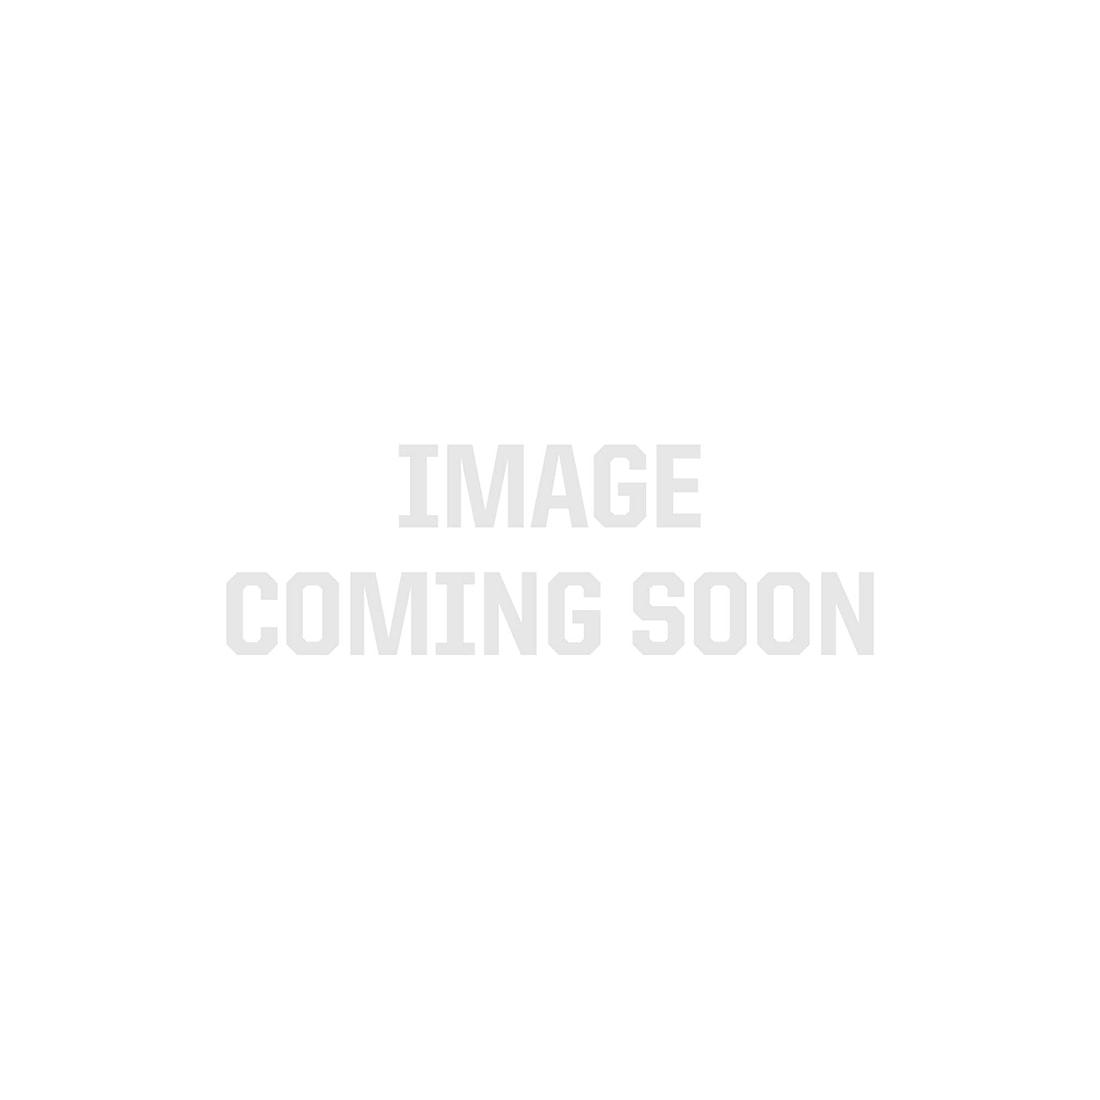 HyperFlex 2835 LED Strip Light - 5,000K - 60/m - CurrentControl - Sample Kit